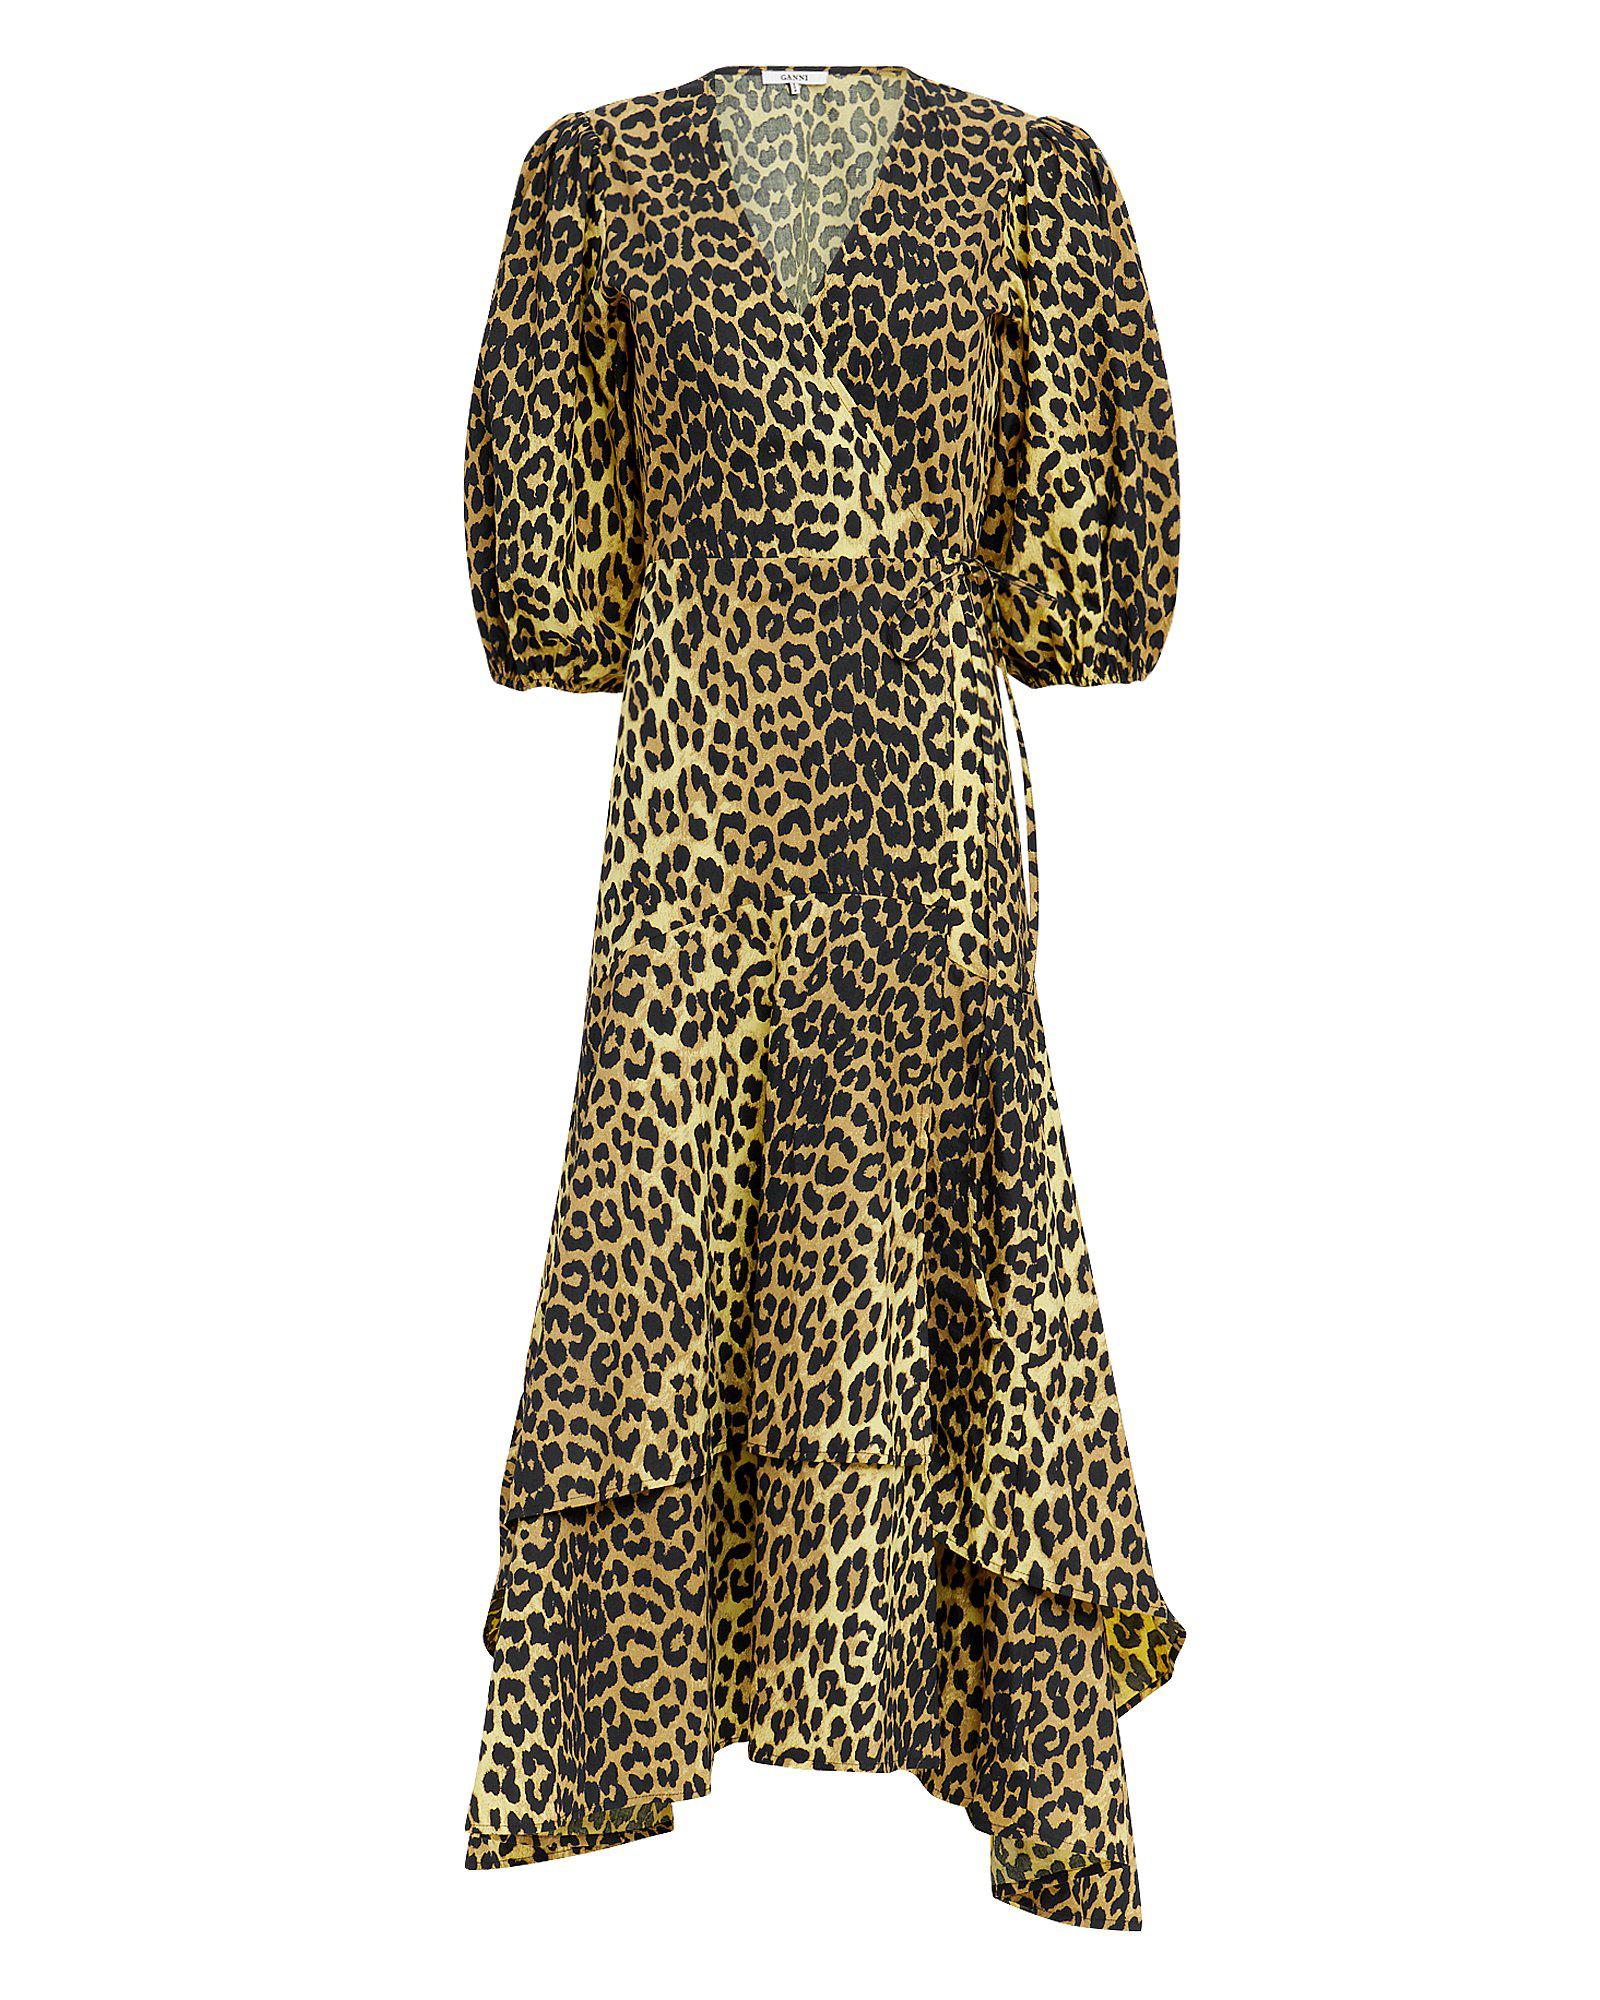 bdb73aaa25c Ganni Bijou Leopard Print Wrap Dress Multi Coloured | ModeSens